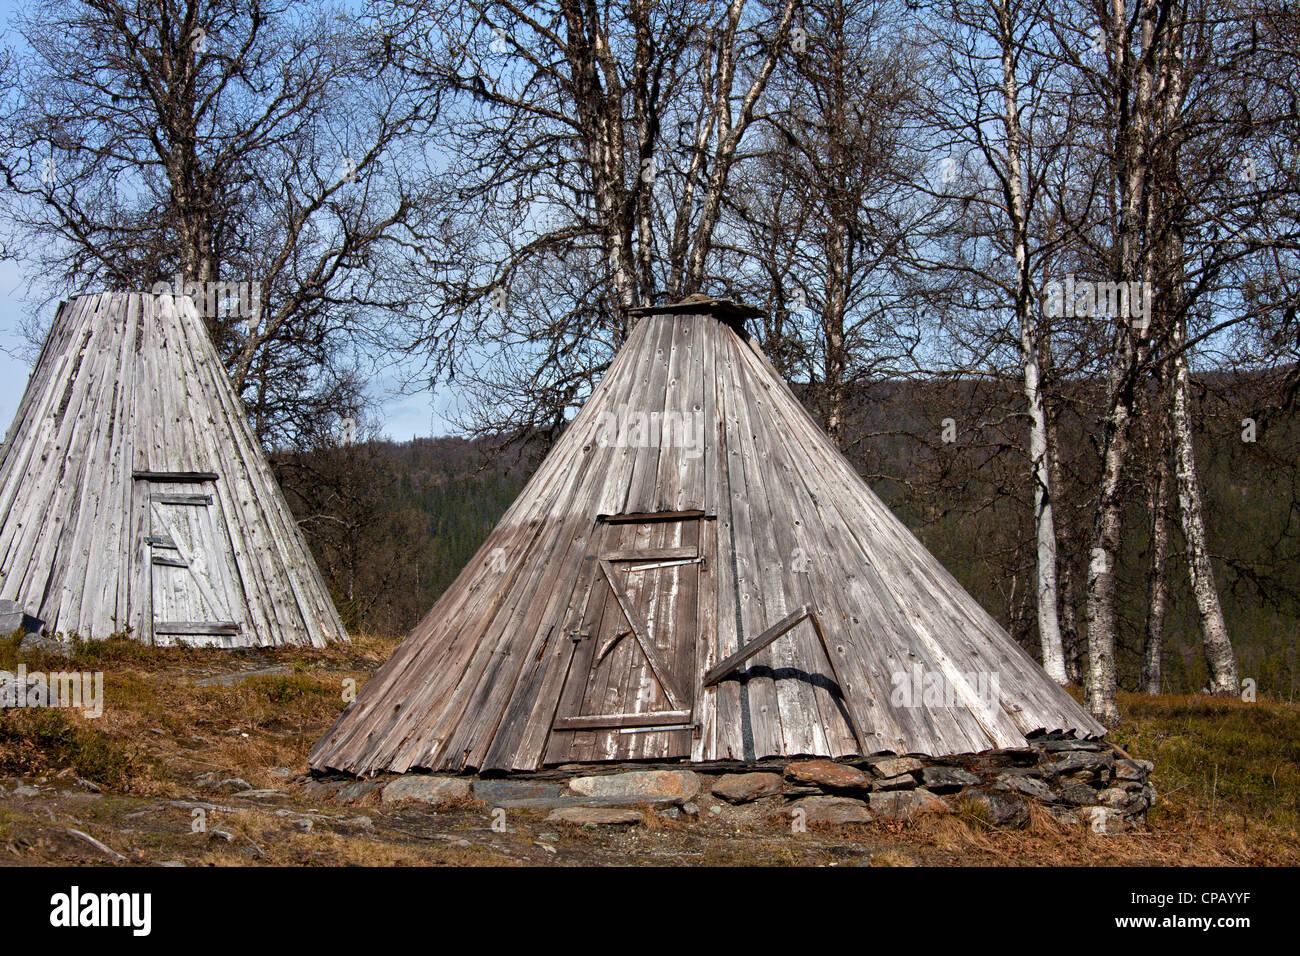 Goahti / kota, traditional Sami wooden huts on the tundra, Lapland, Sweden - Stock Image